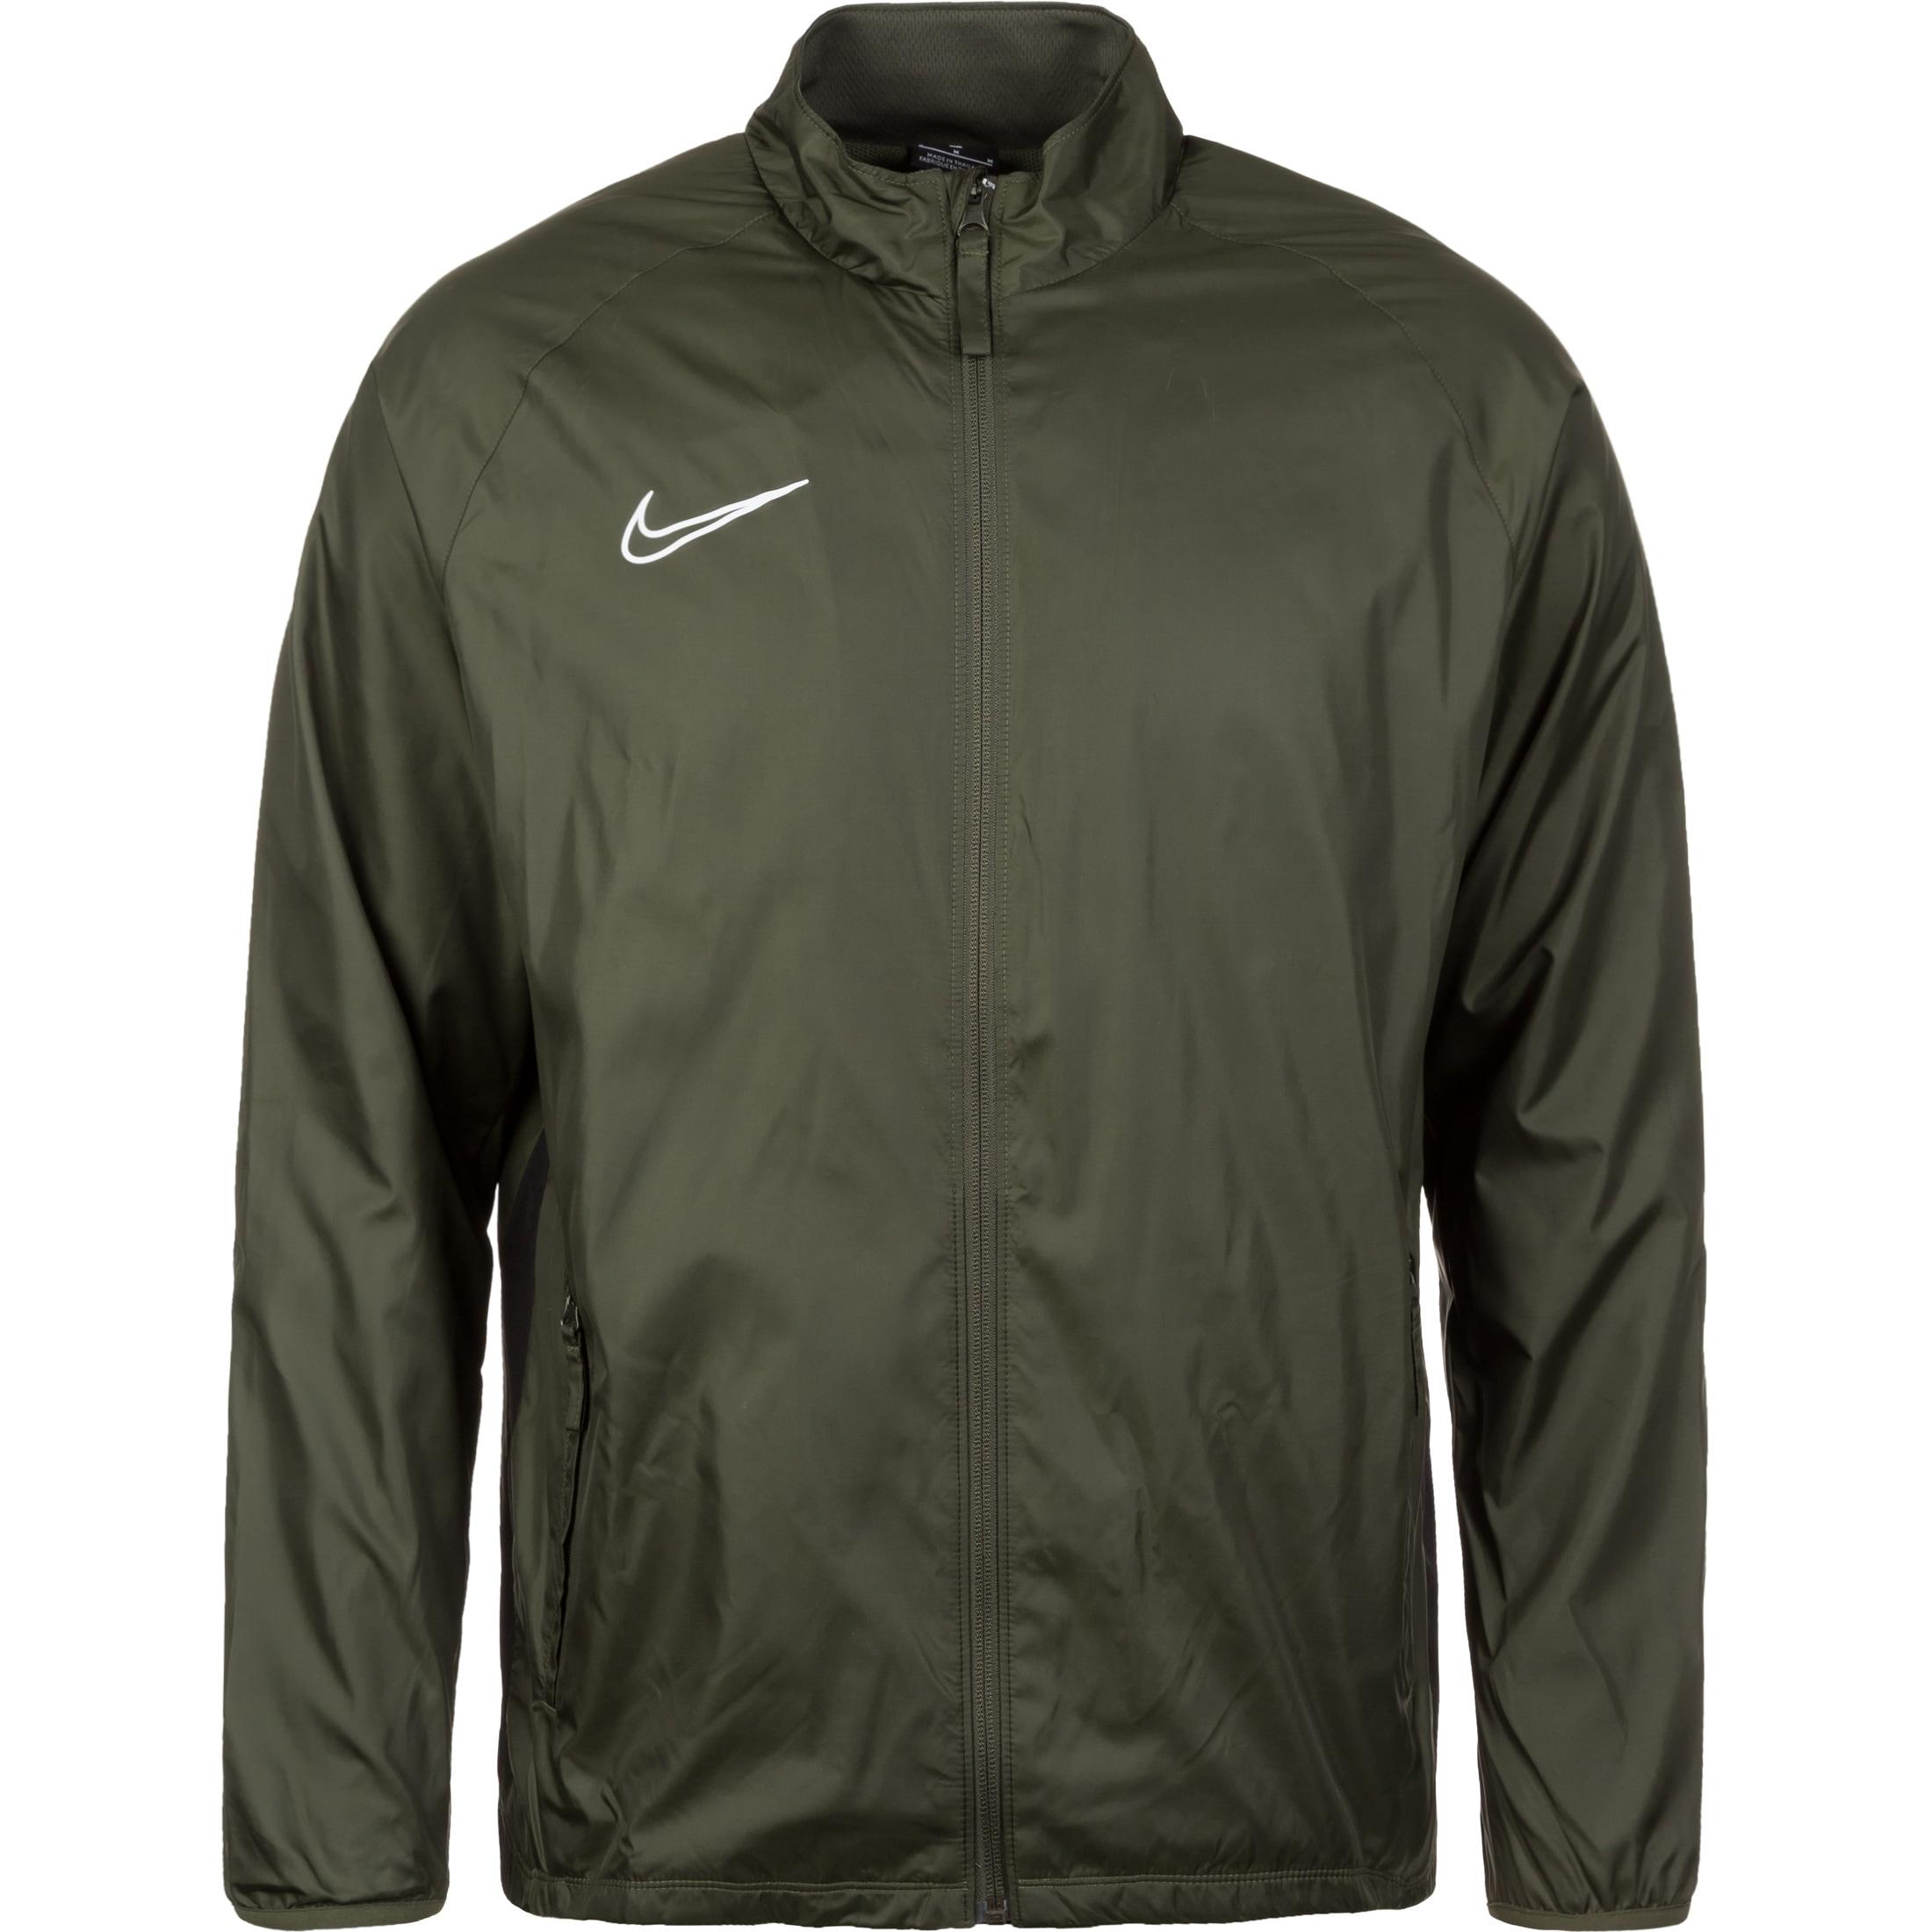 Nike Trainingsjacke Repel Academy grün Herren Übergangsjacken Jacken Mäntel